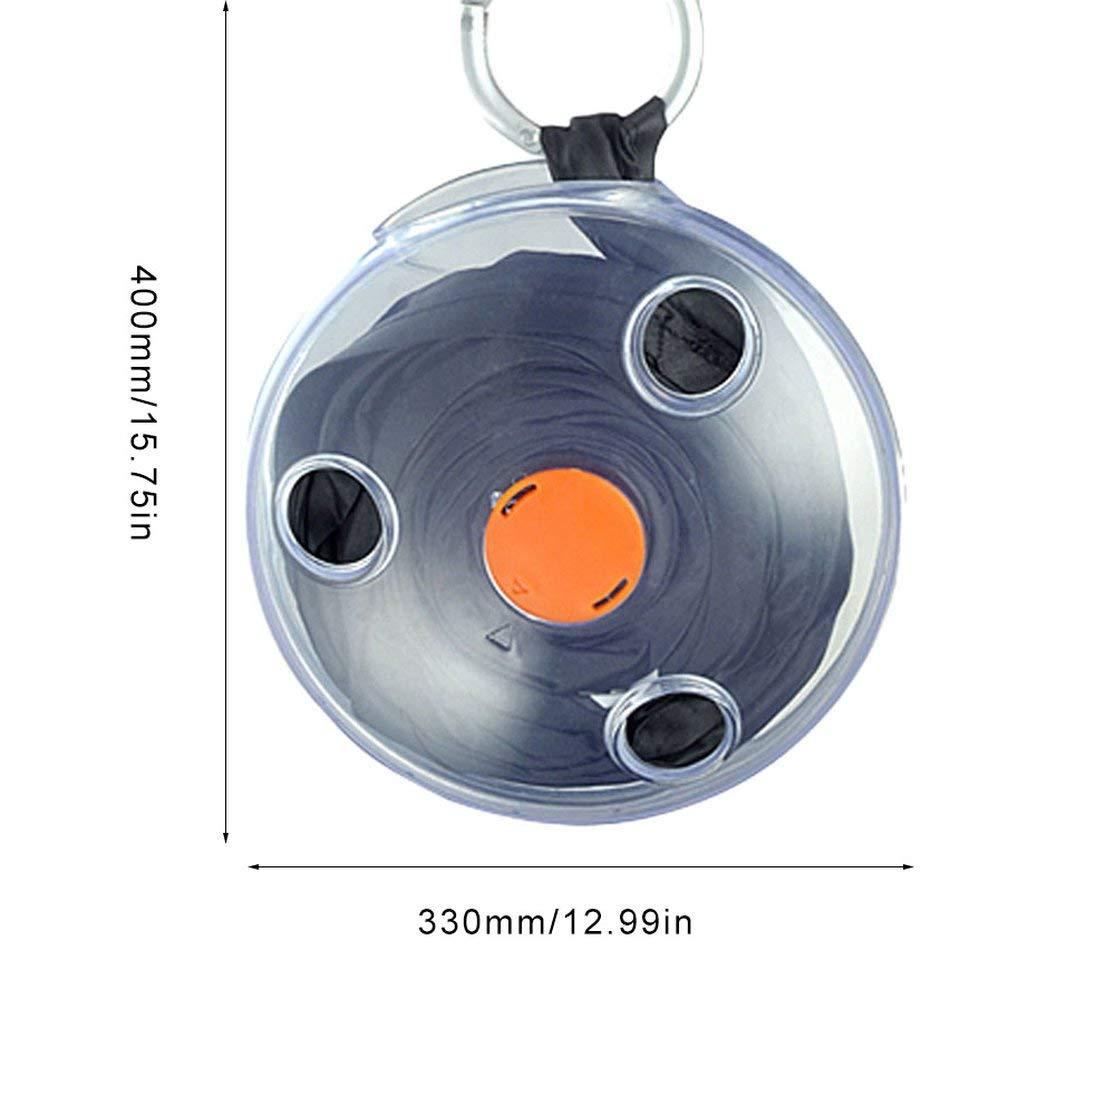 Small Disc Shopping Storage Bag Portable Multi-purpose Large Space Single Shoulder Strap Ingenious Design